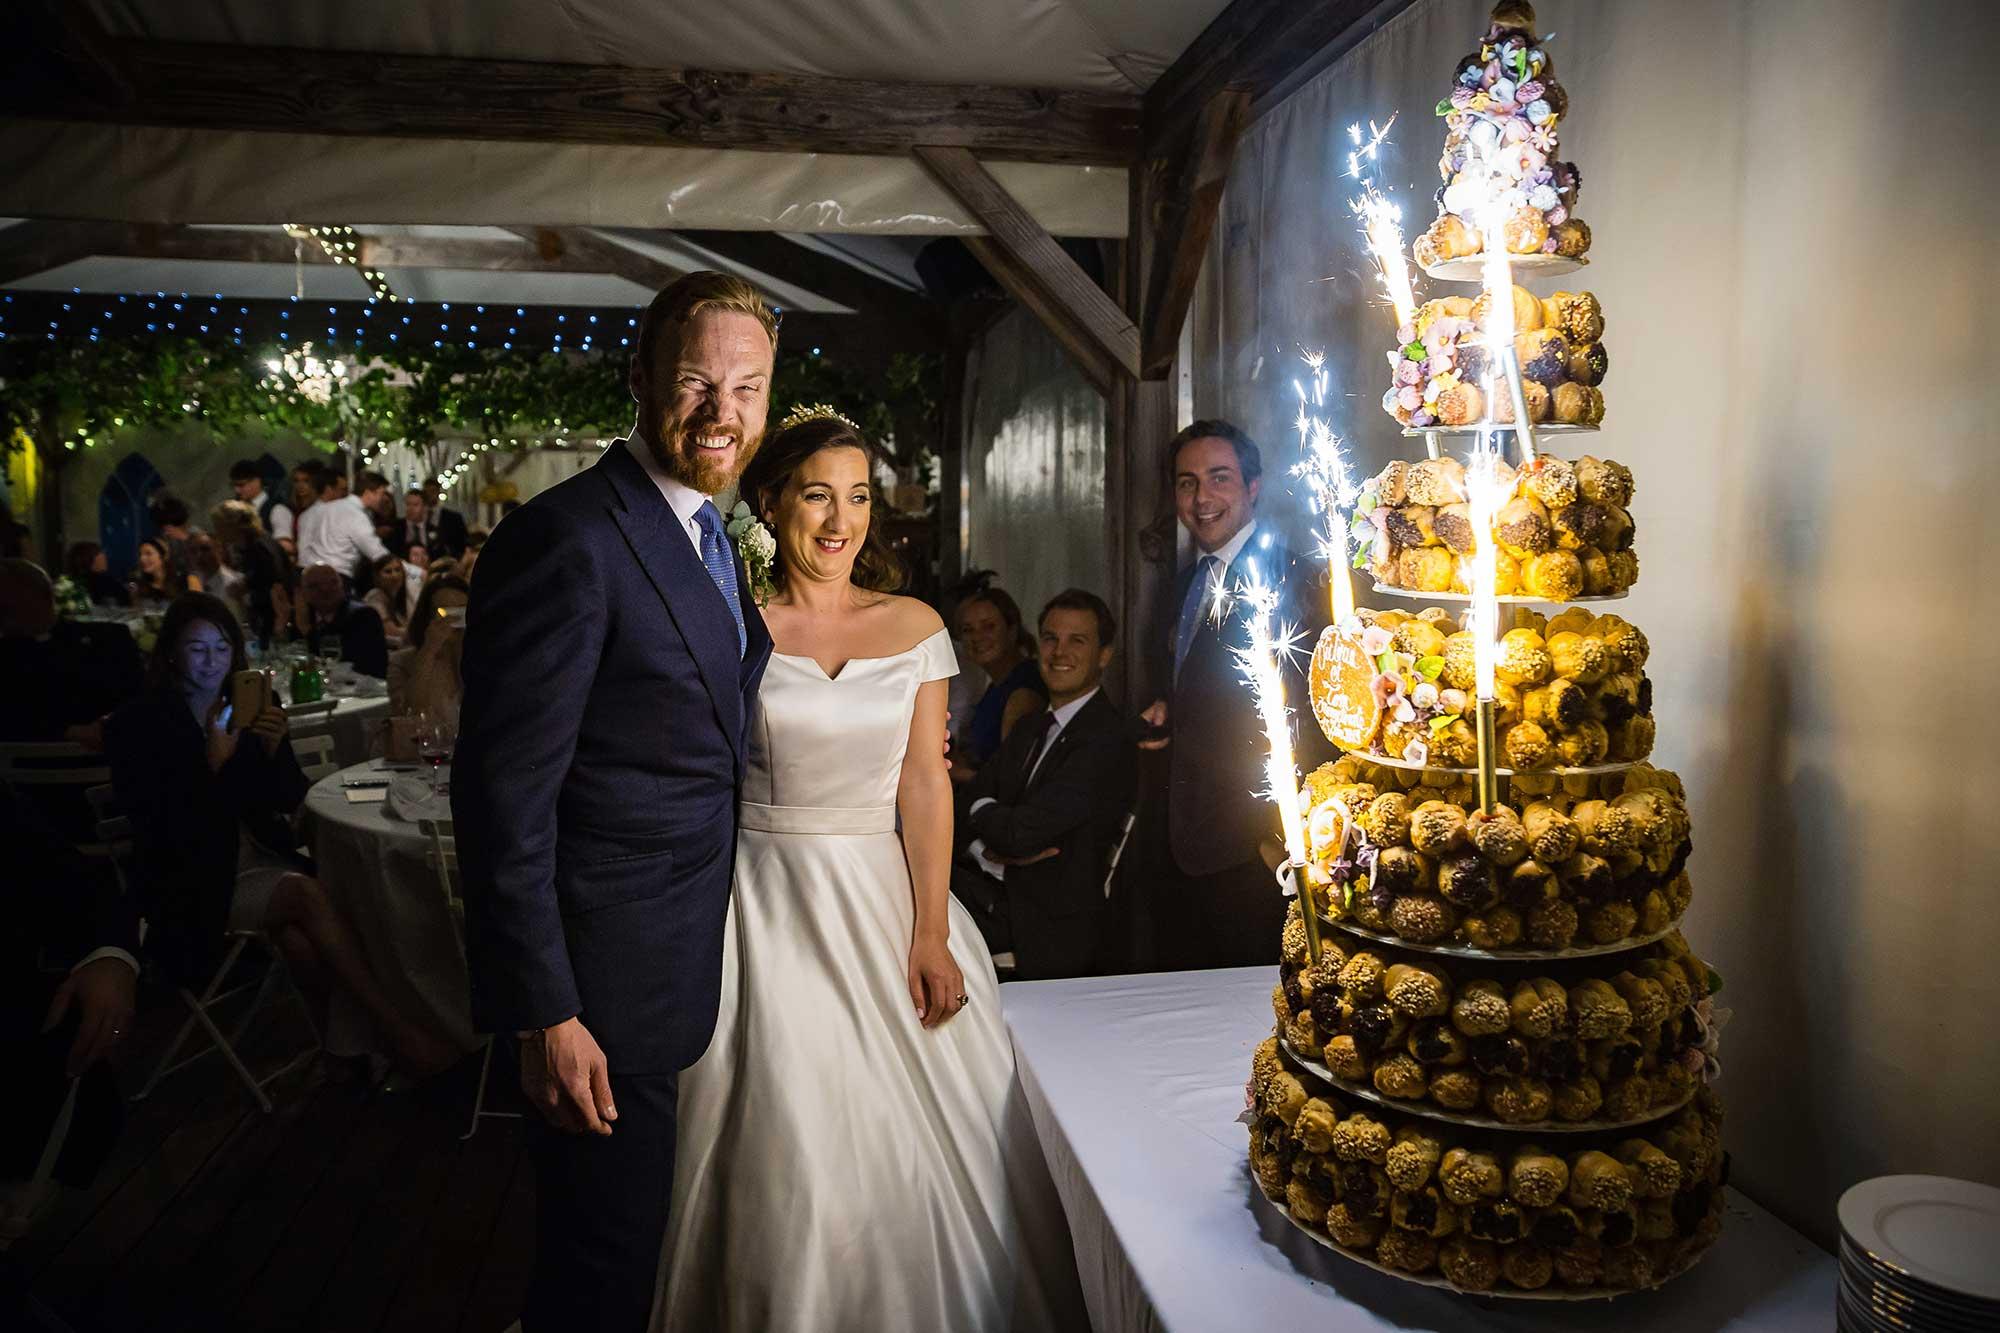 Chateau de Brametourte cake